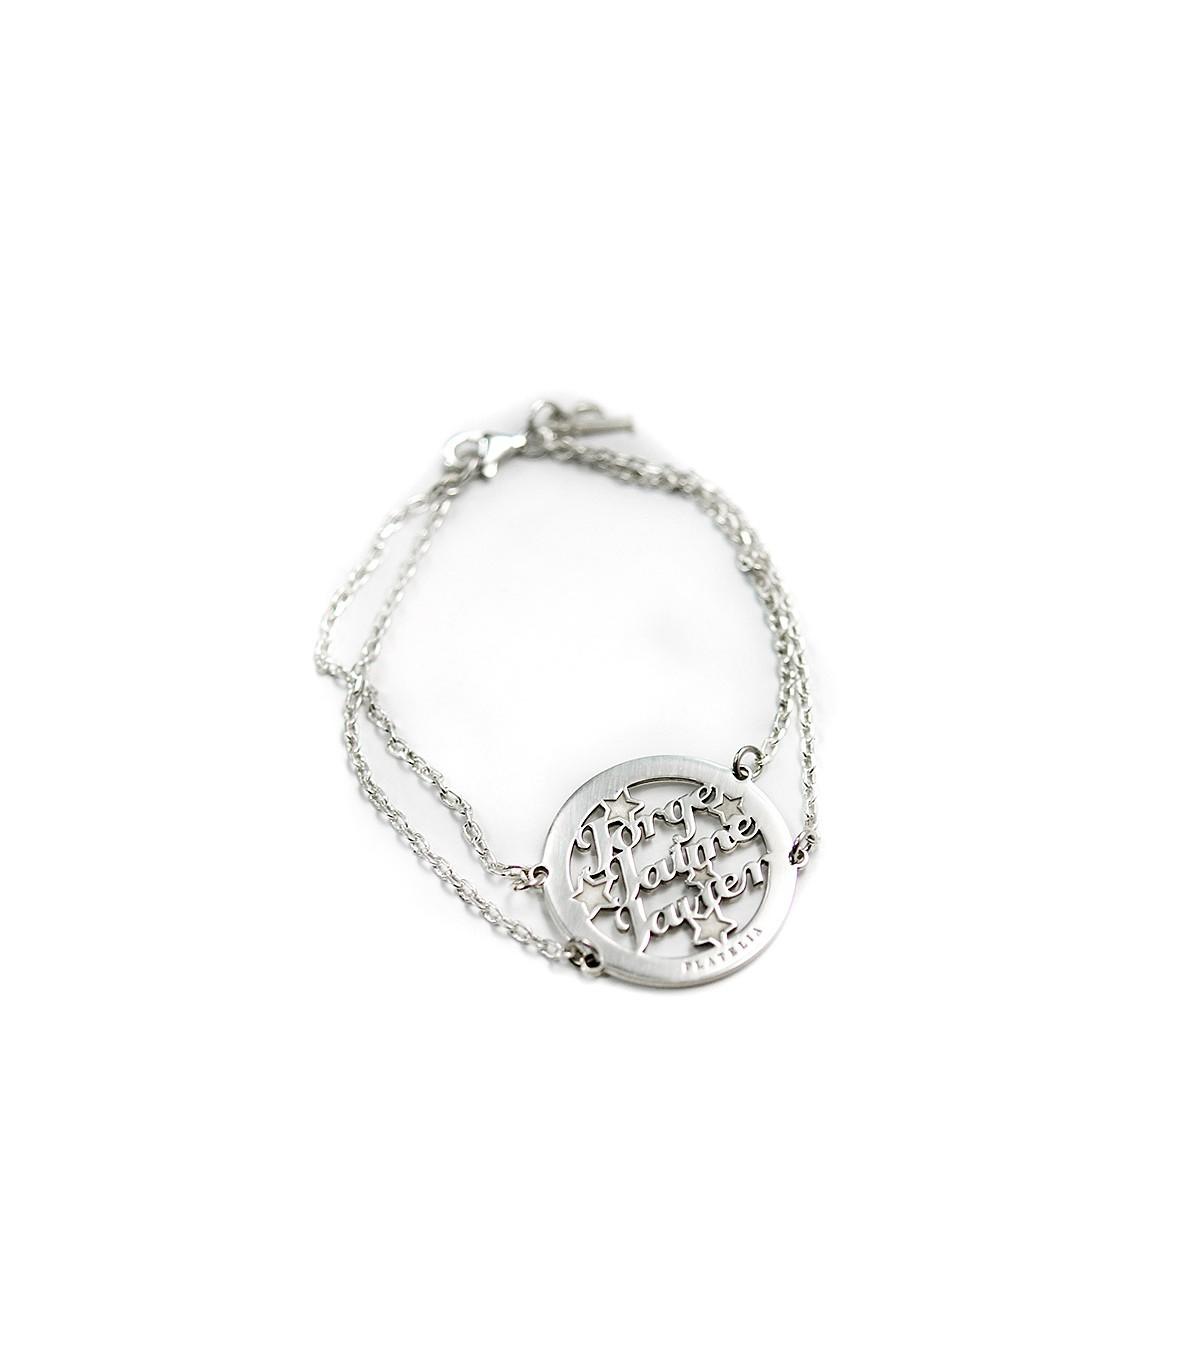 d5de947f488d Pulsera de plata personalizada Amore con cadena. Joyas para regalar    Platelia